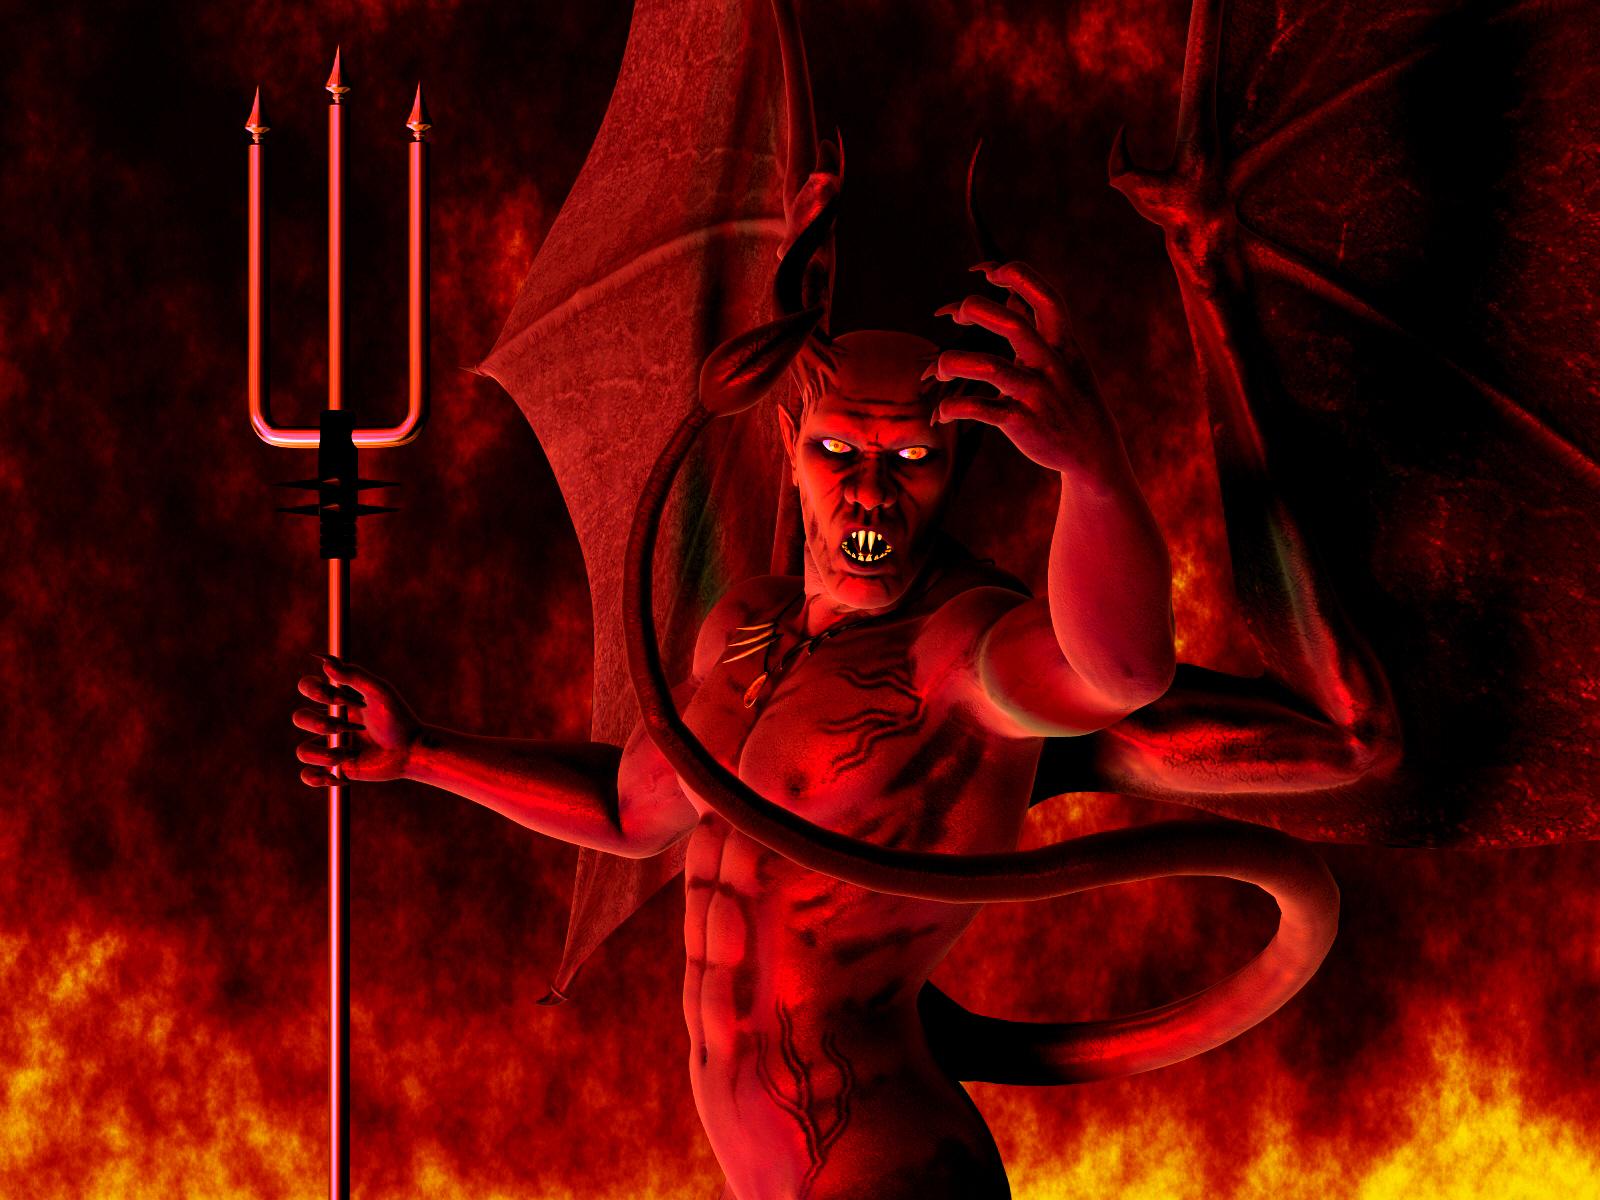 satan-image